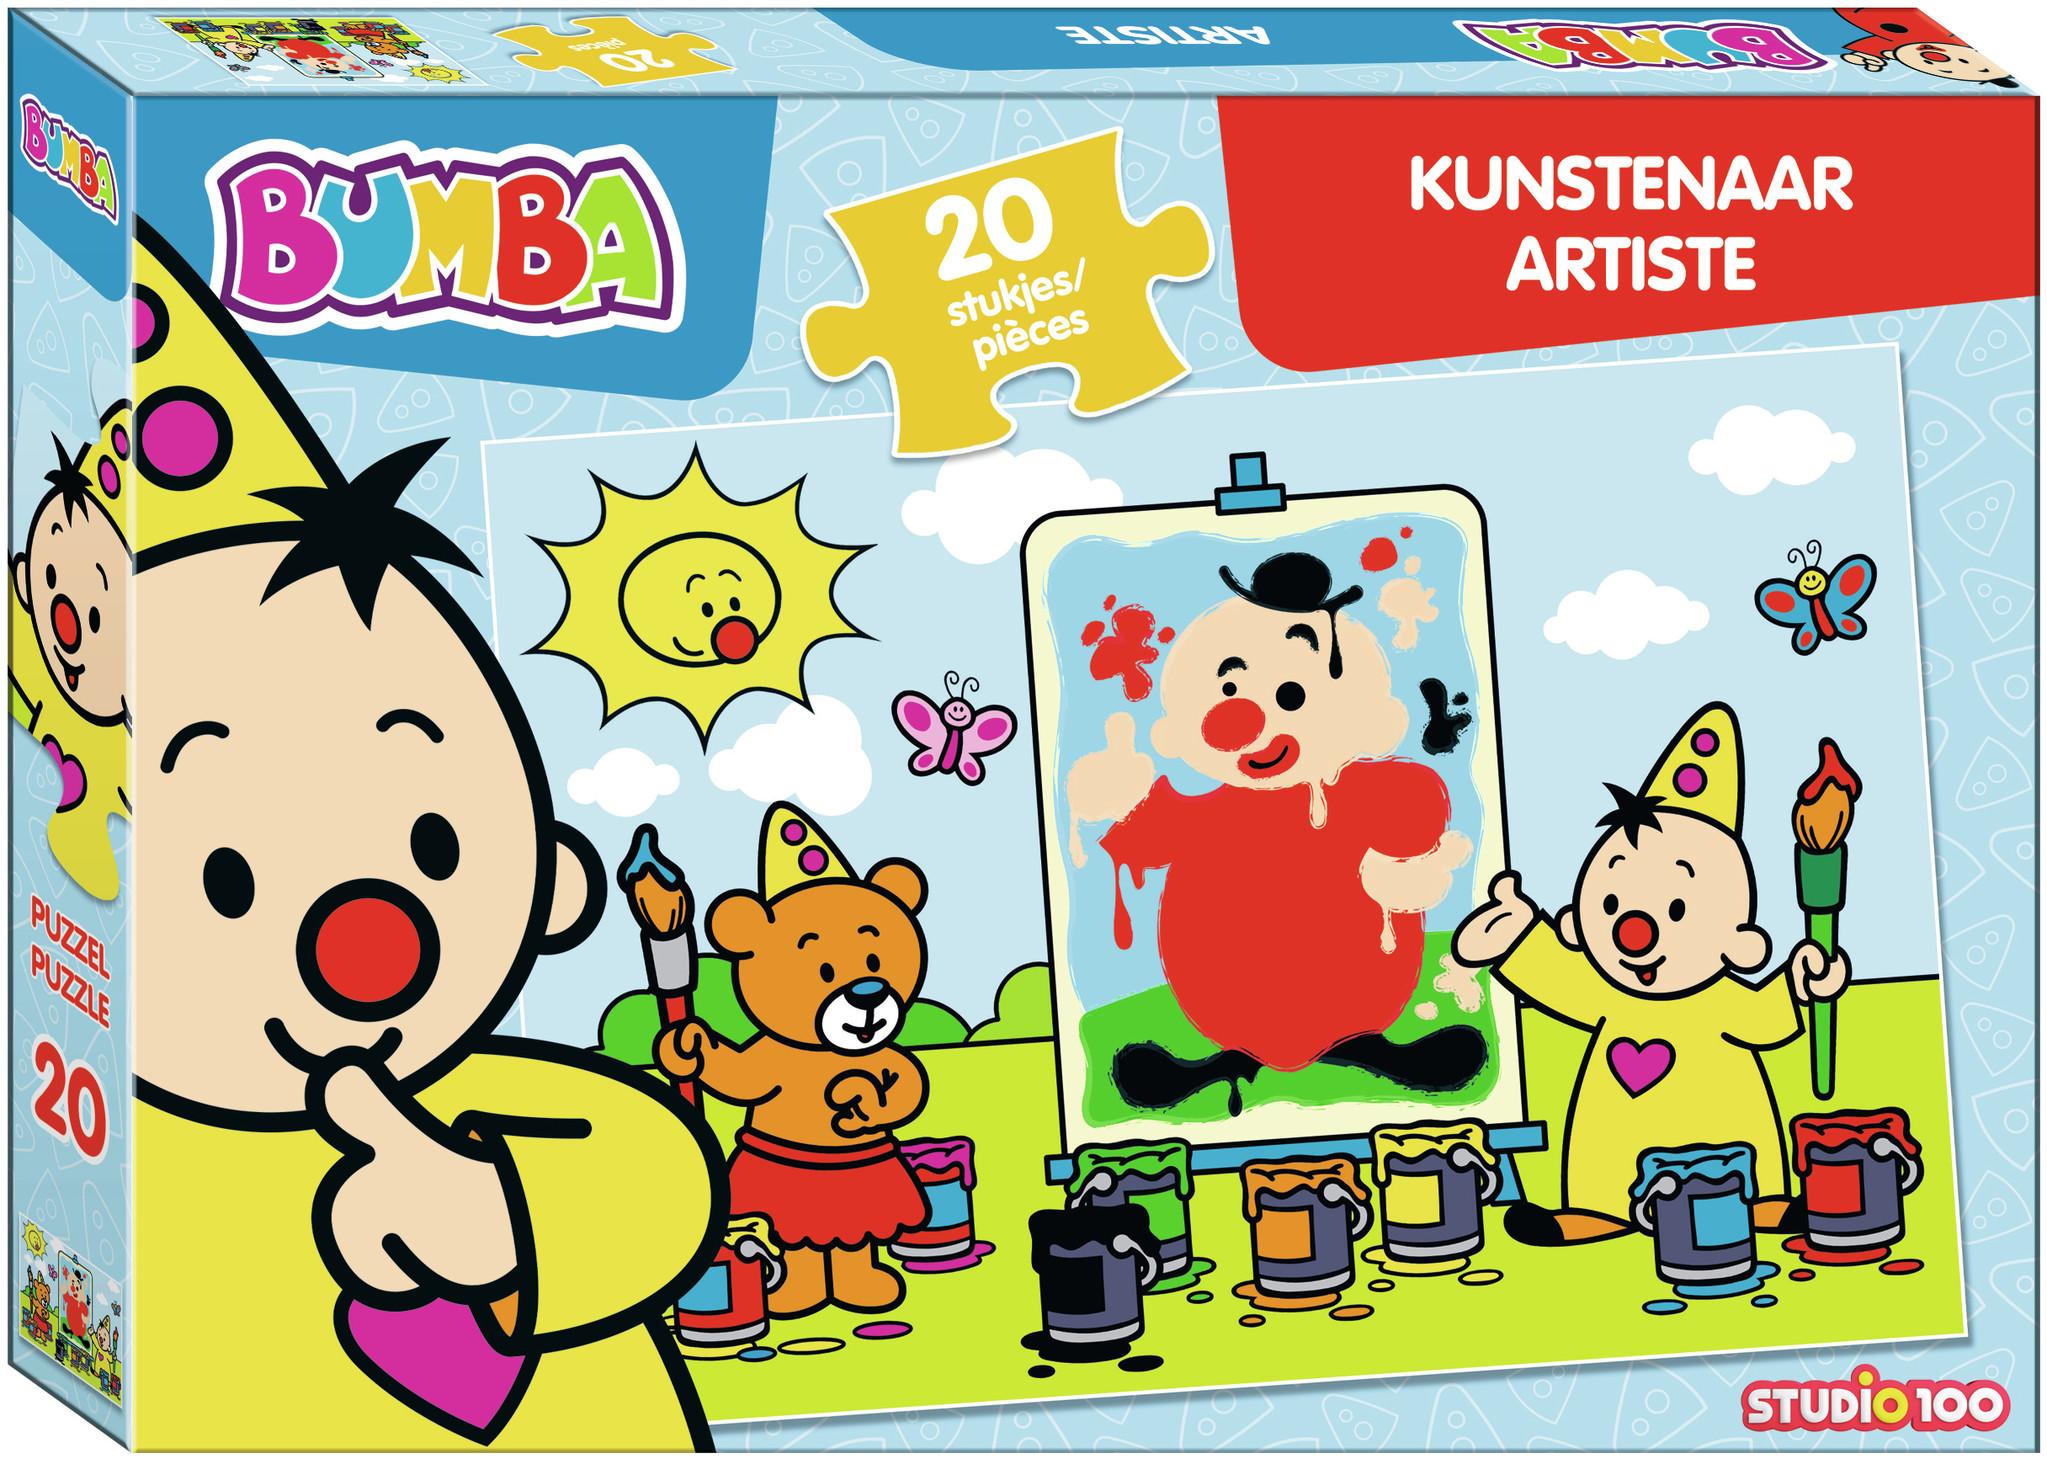 Puzzel Bumba kunstenaar Bumba: 20 stukjes